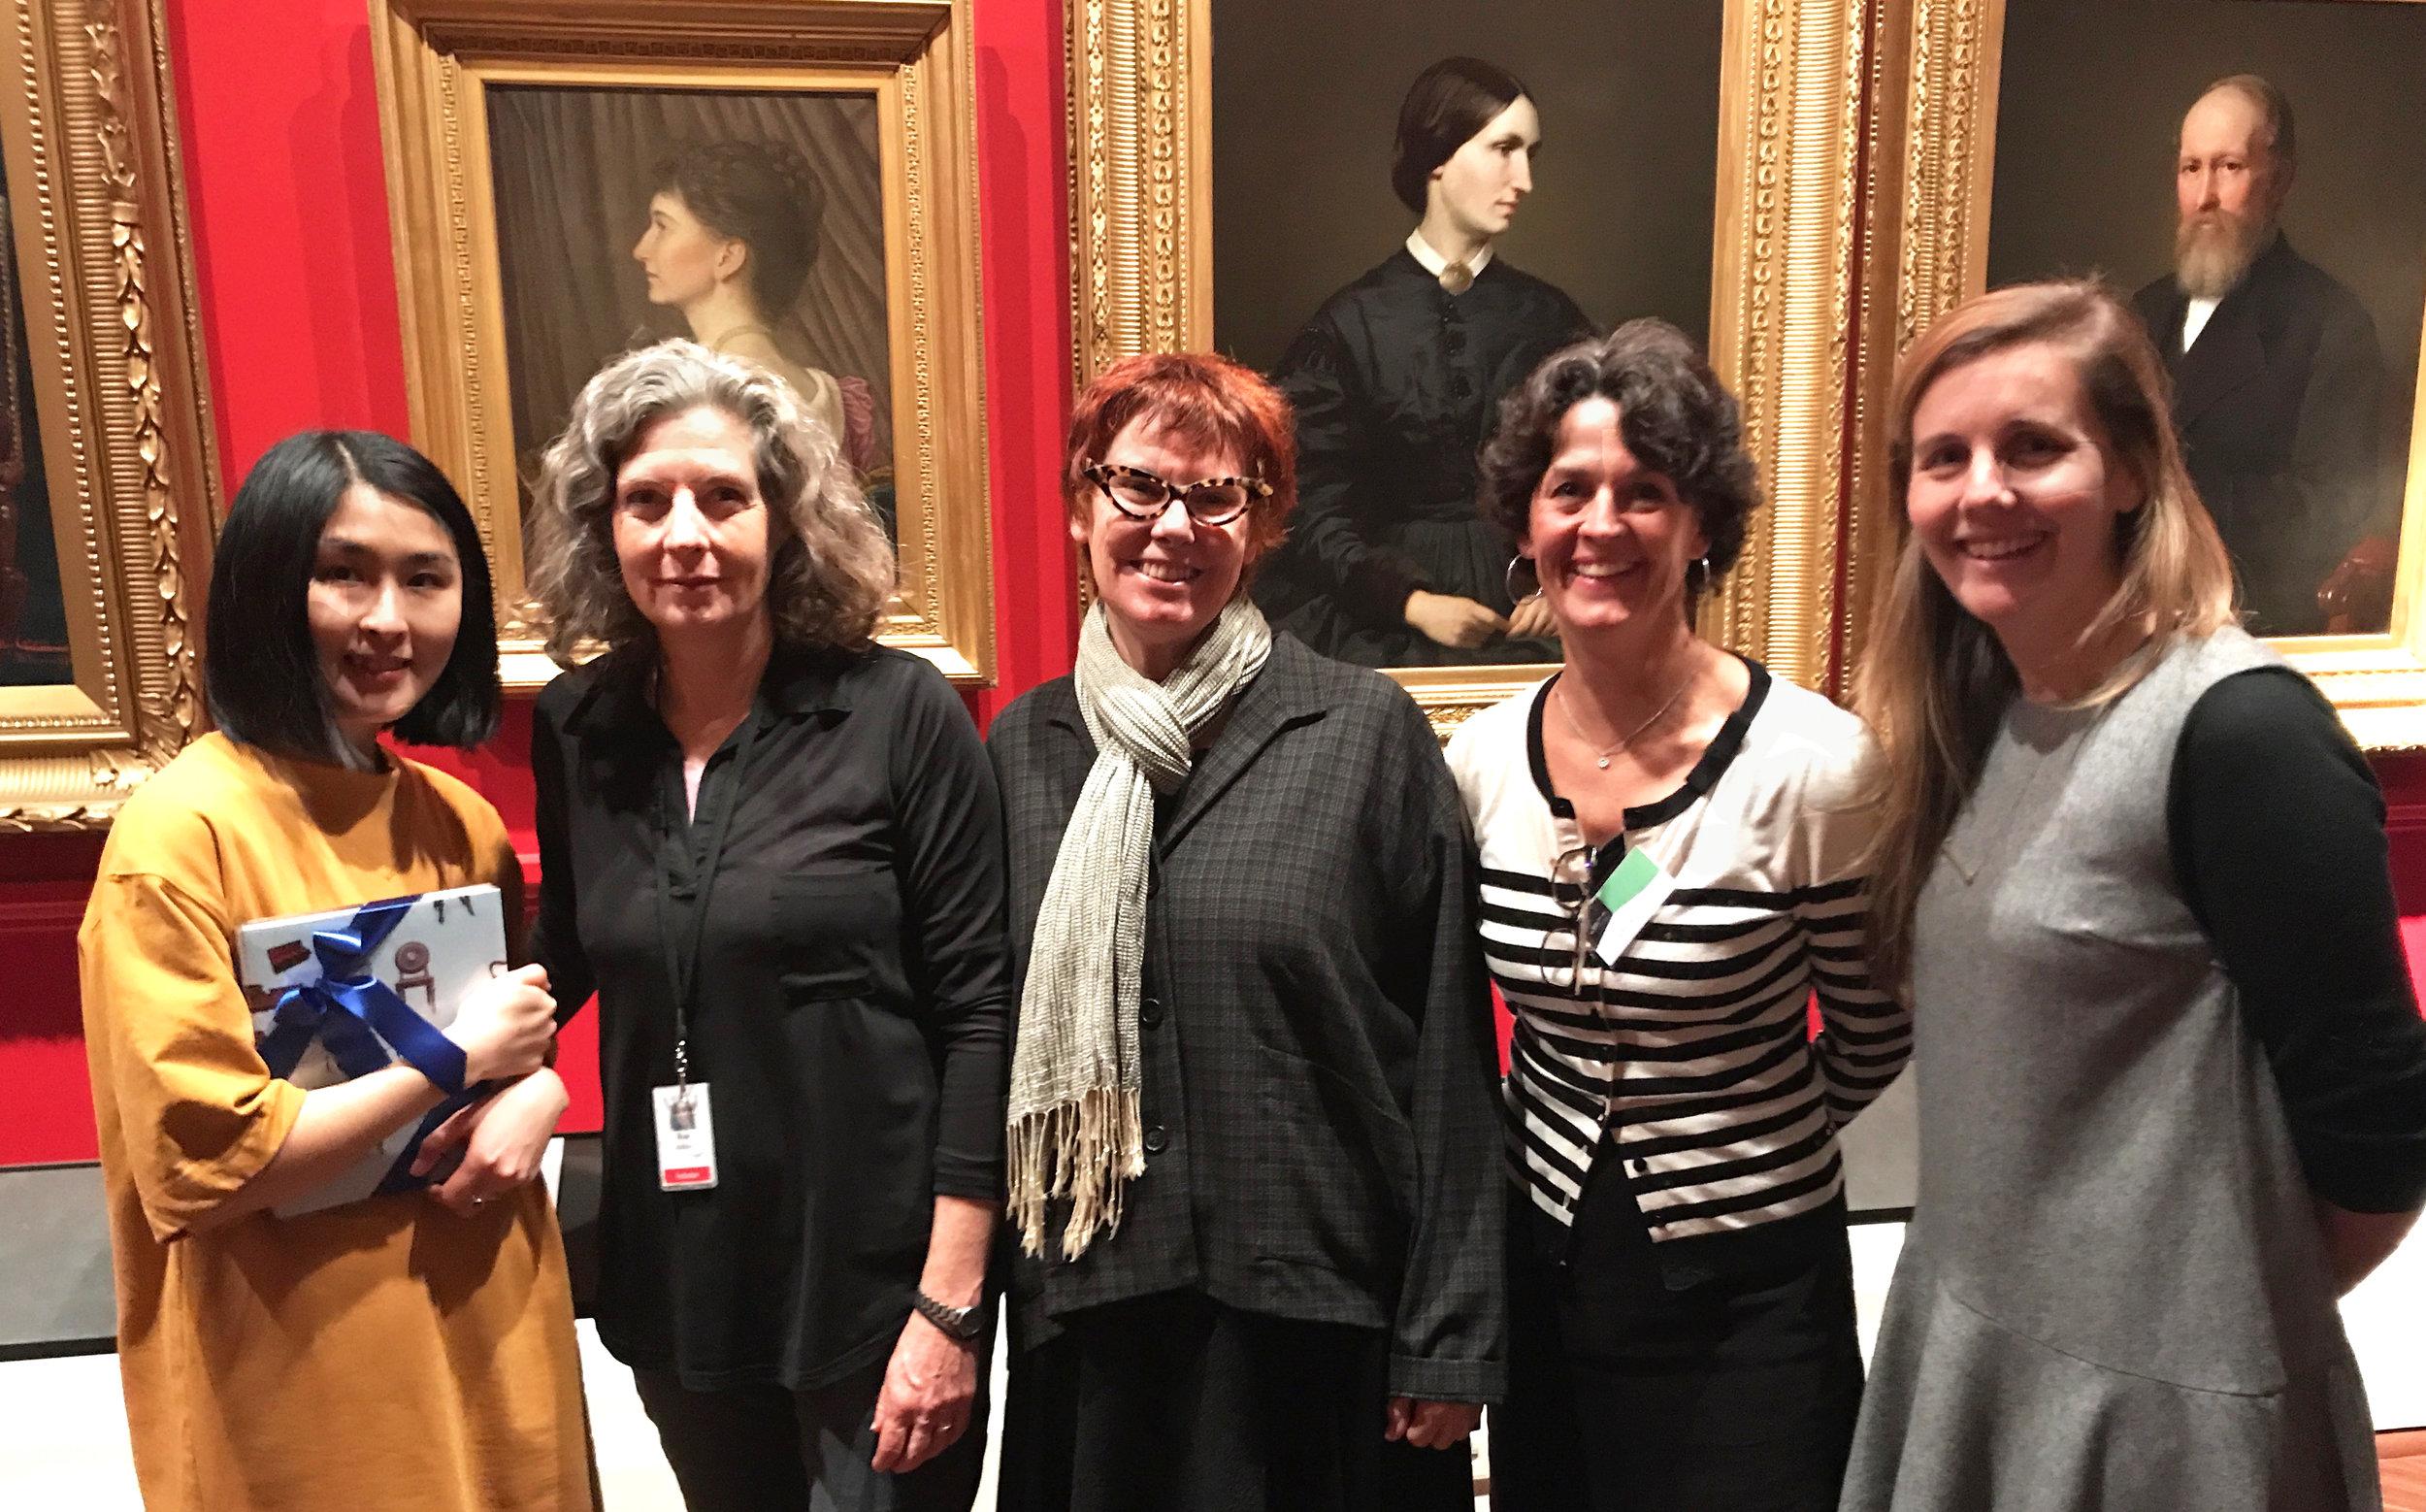 2017 Creative Fellowship Residency announcement event, State Library Victoria L-R: 2017 resident Kyoko Imazu, 2016 resident Ros Atkins, Tess Edwards, Indra Kurzeme, Nicole Bowller